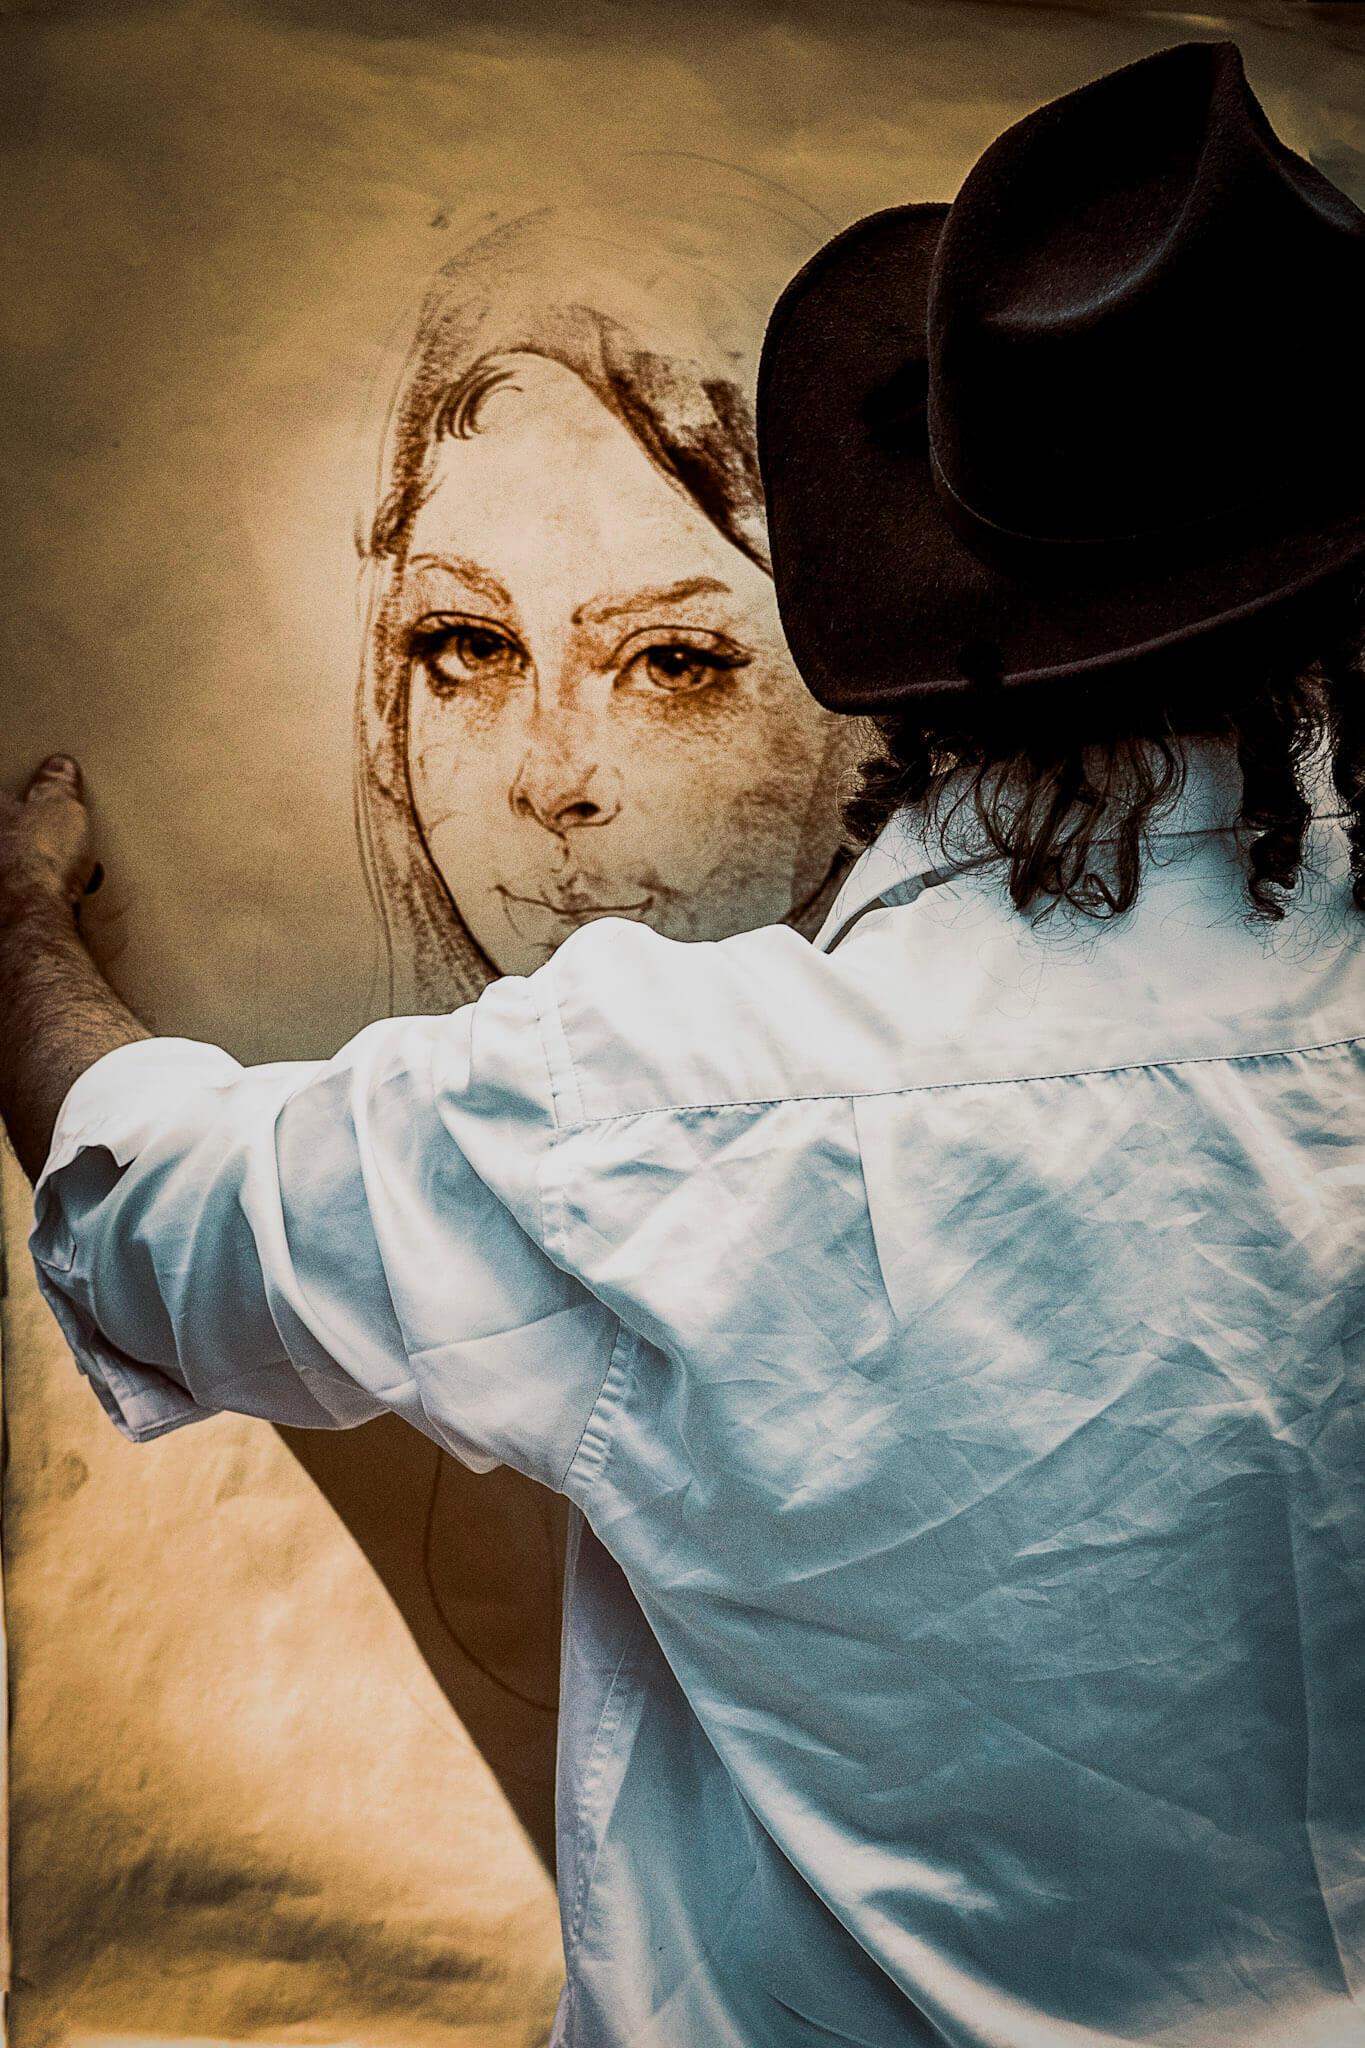 21-The artist